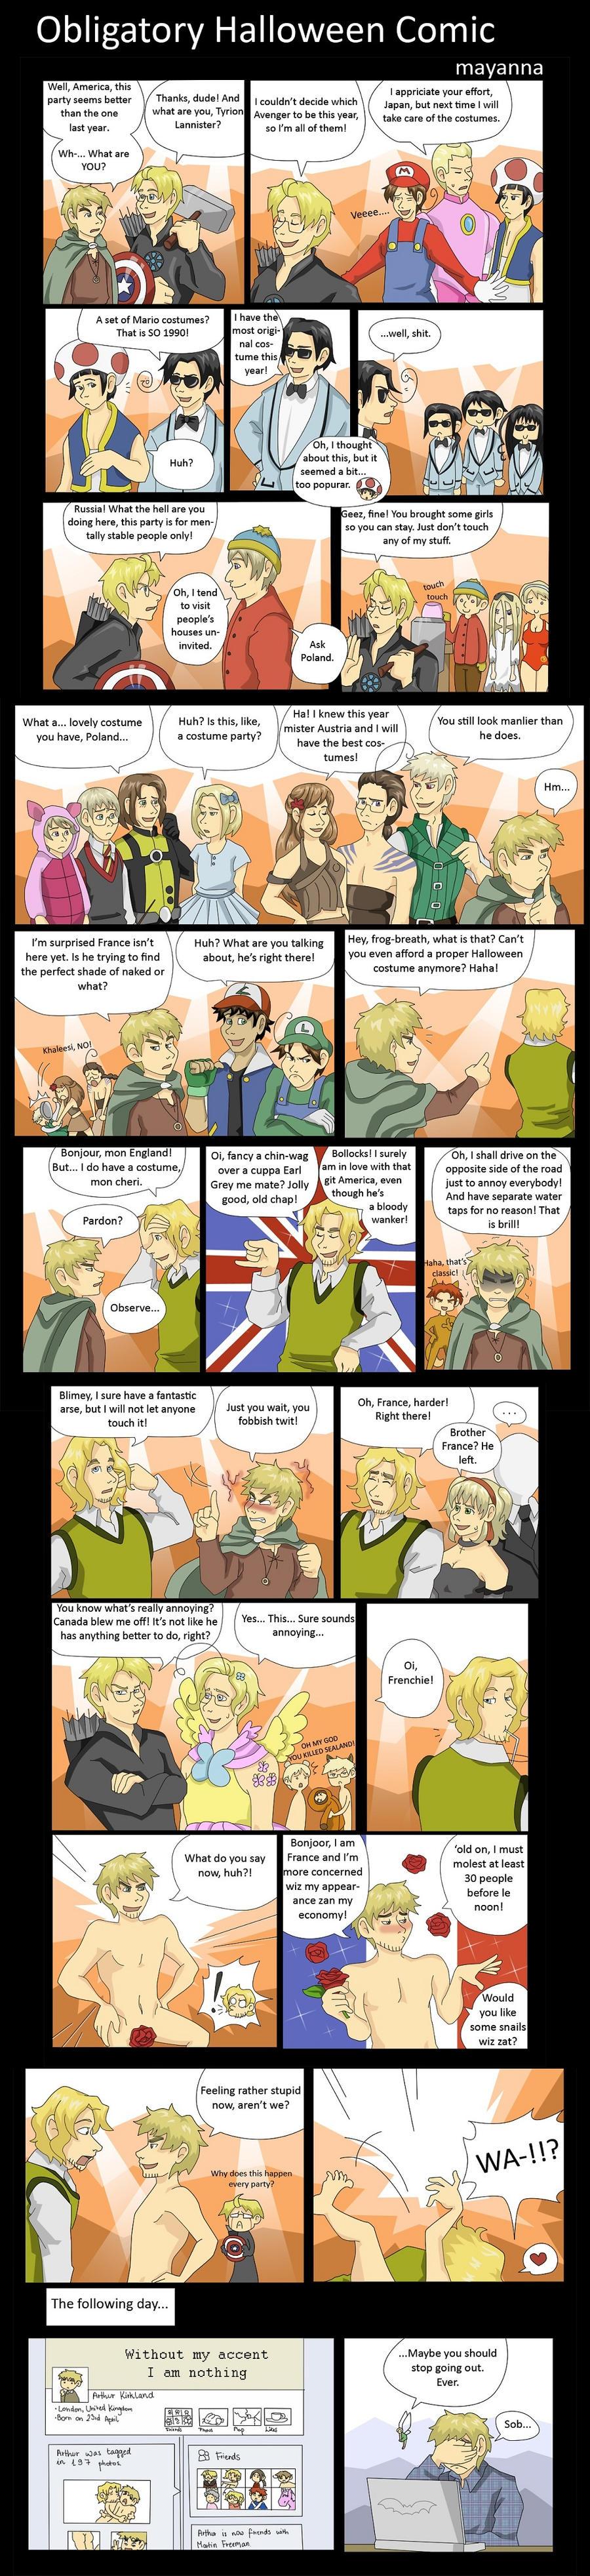 Hetalia: Obligatory Halloween Comic by mayanna